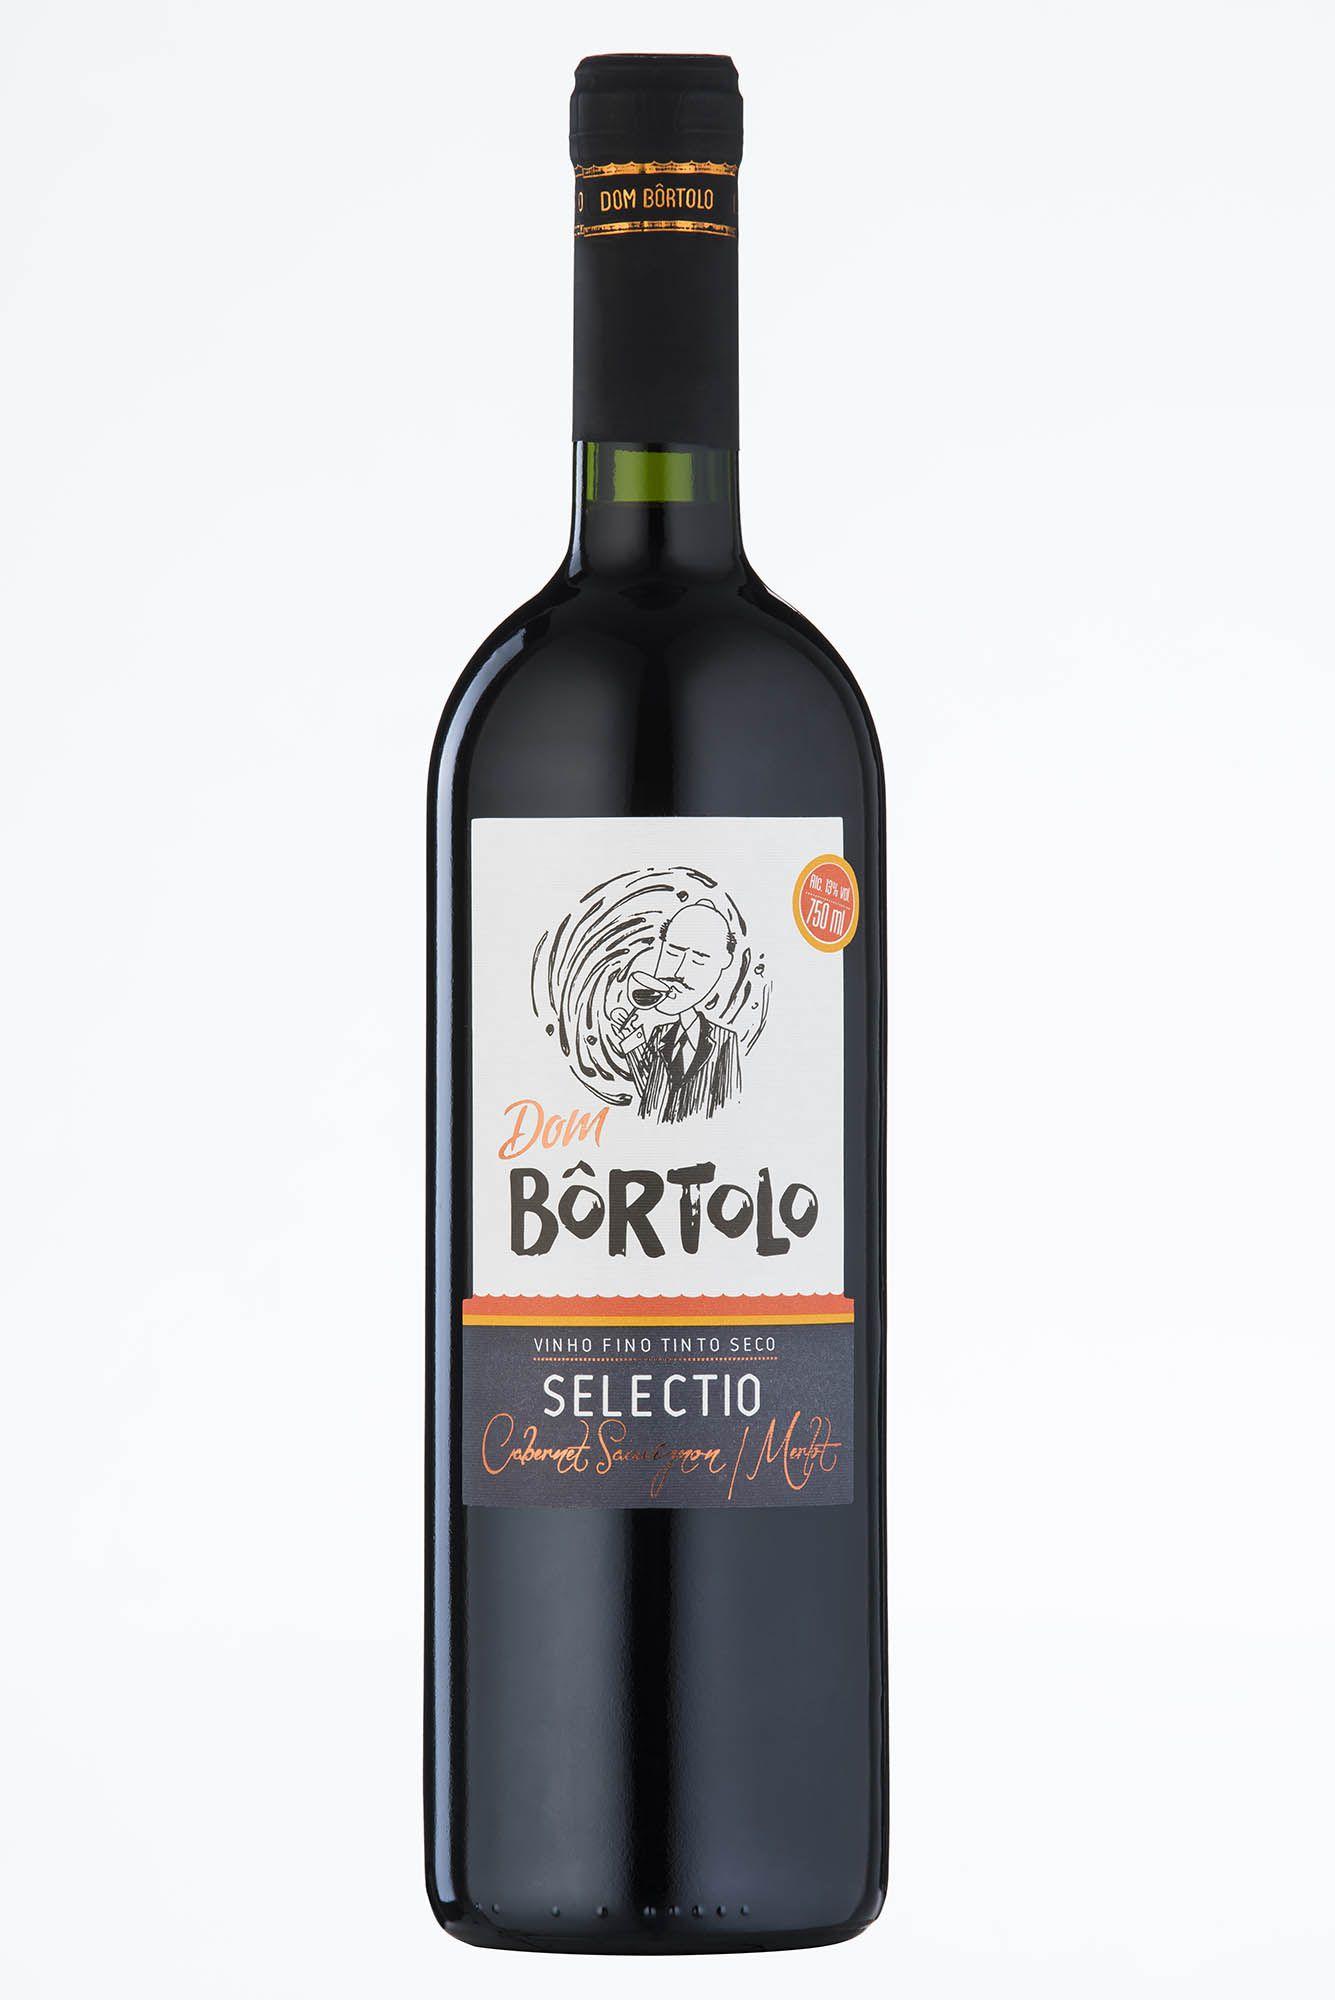 Caixa com 6 un - Vinho Selectio Cabernet Sauvignon/Merlot 750ml